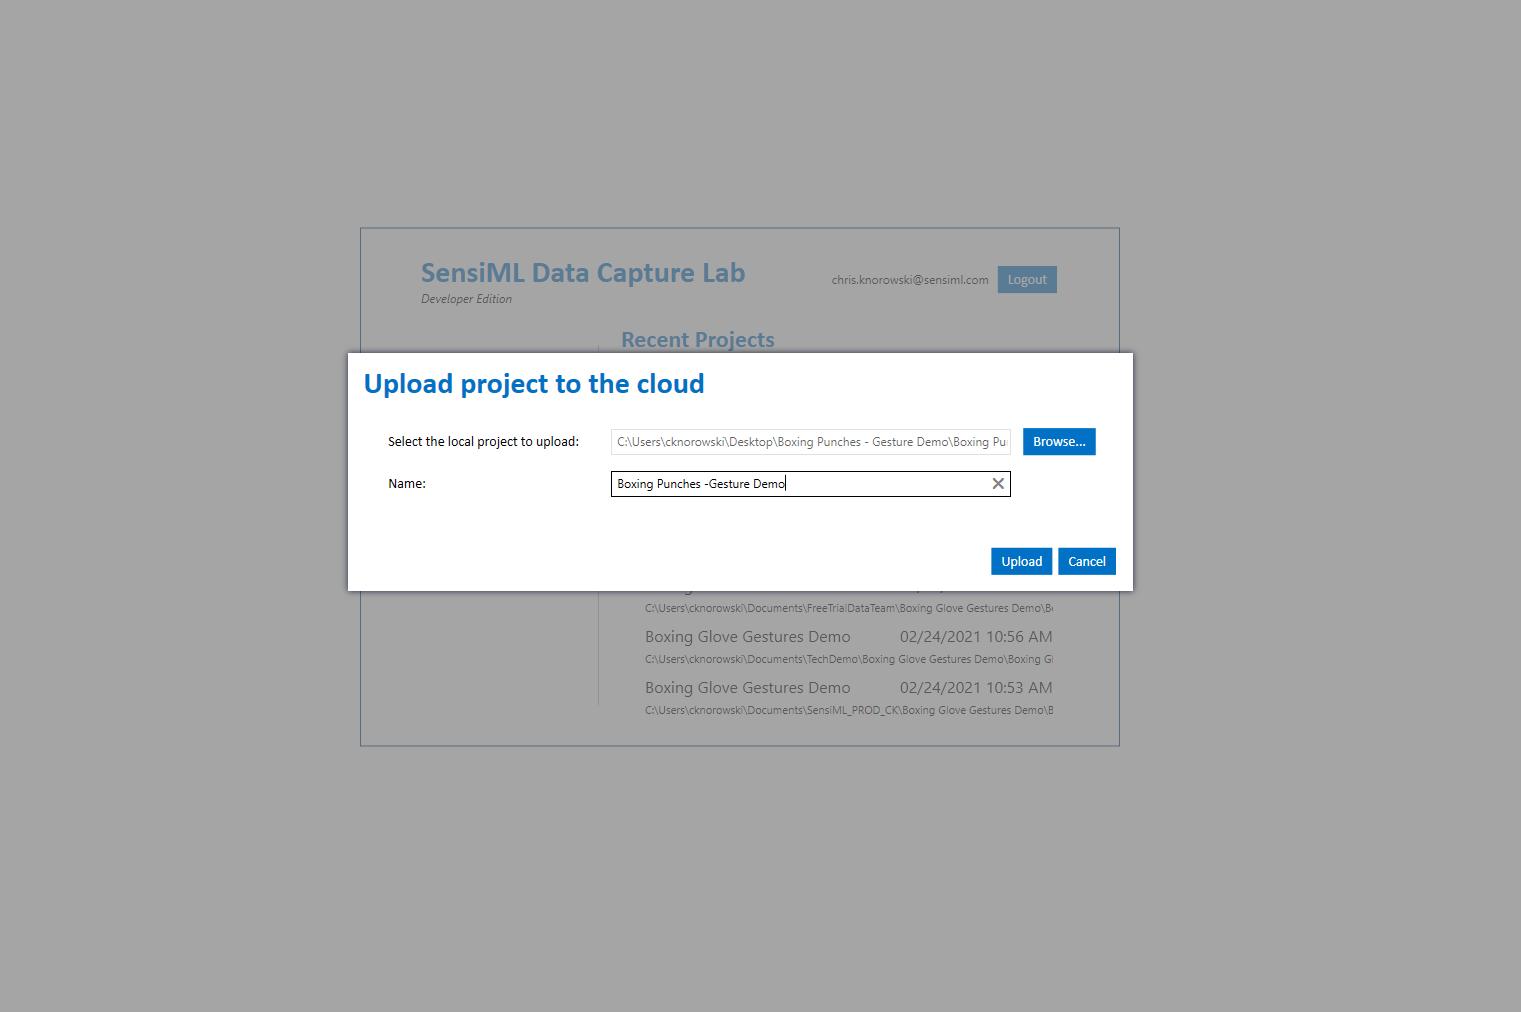 SensiML Data Capture Lab